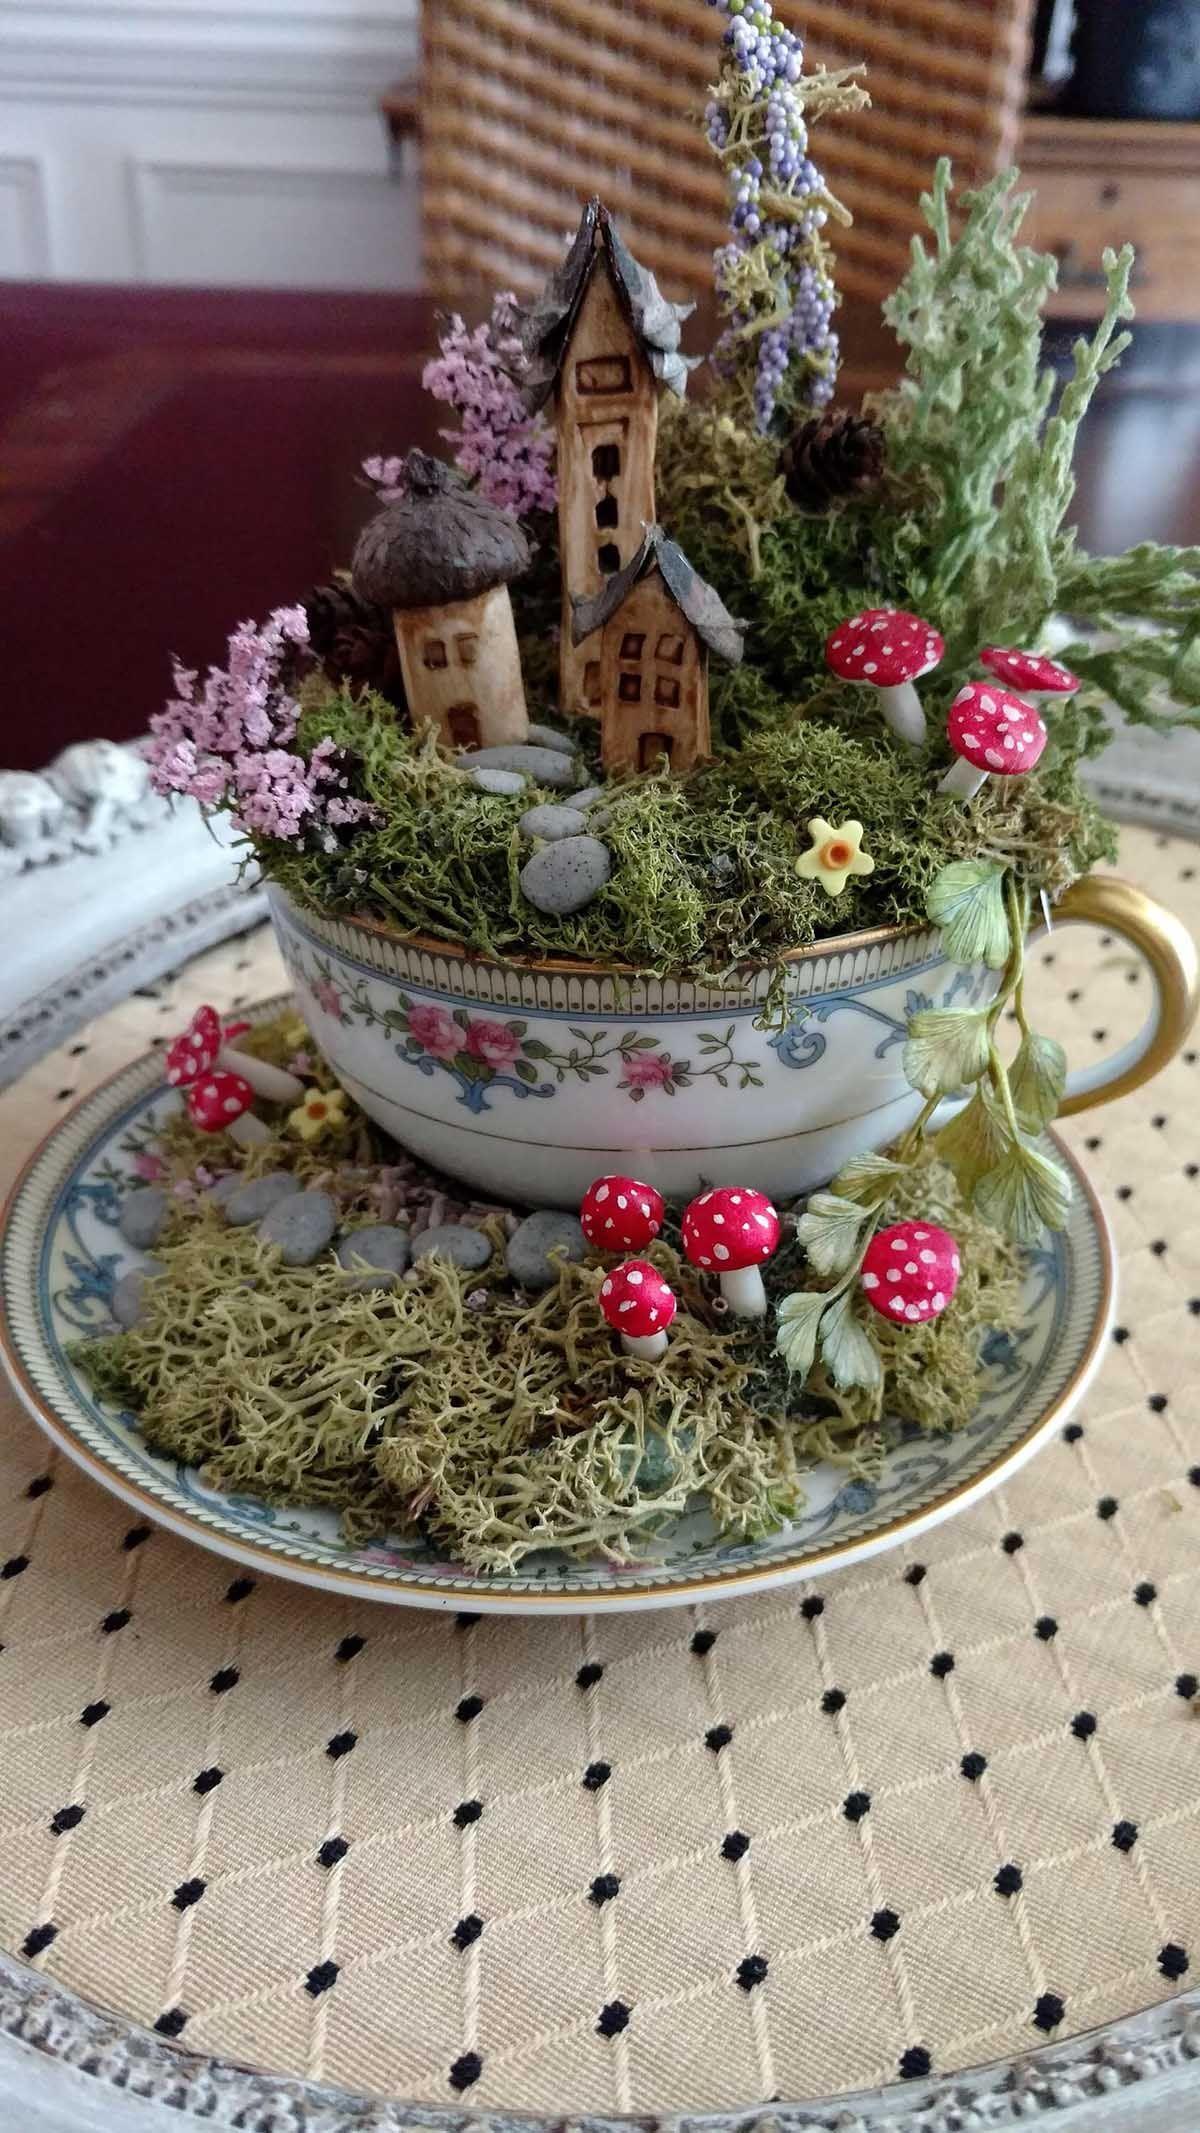 Quaint small village in pixie territory fairy fairies garden